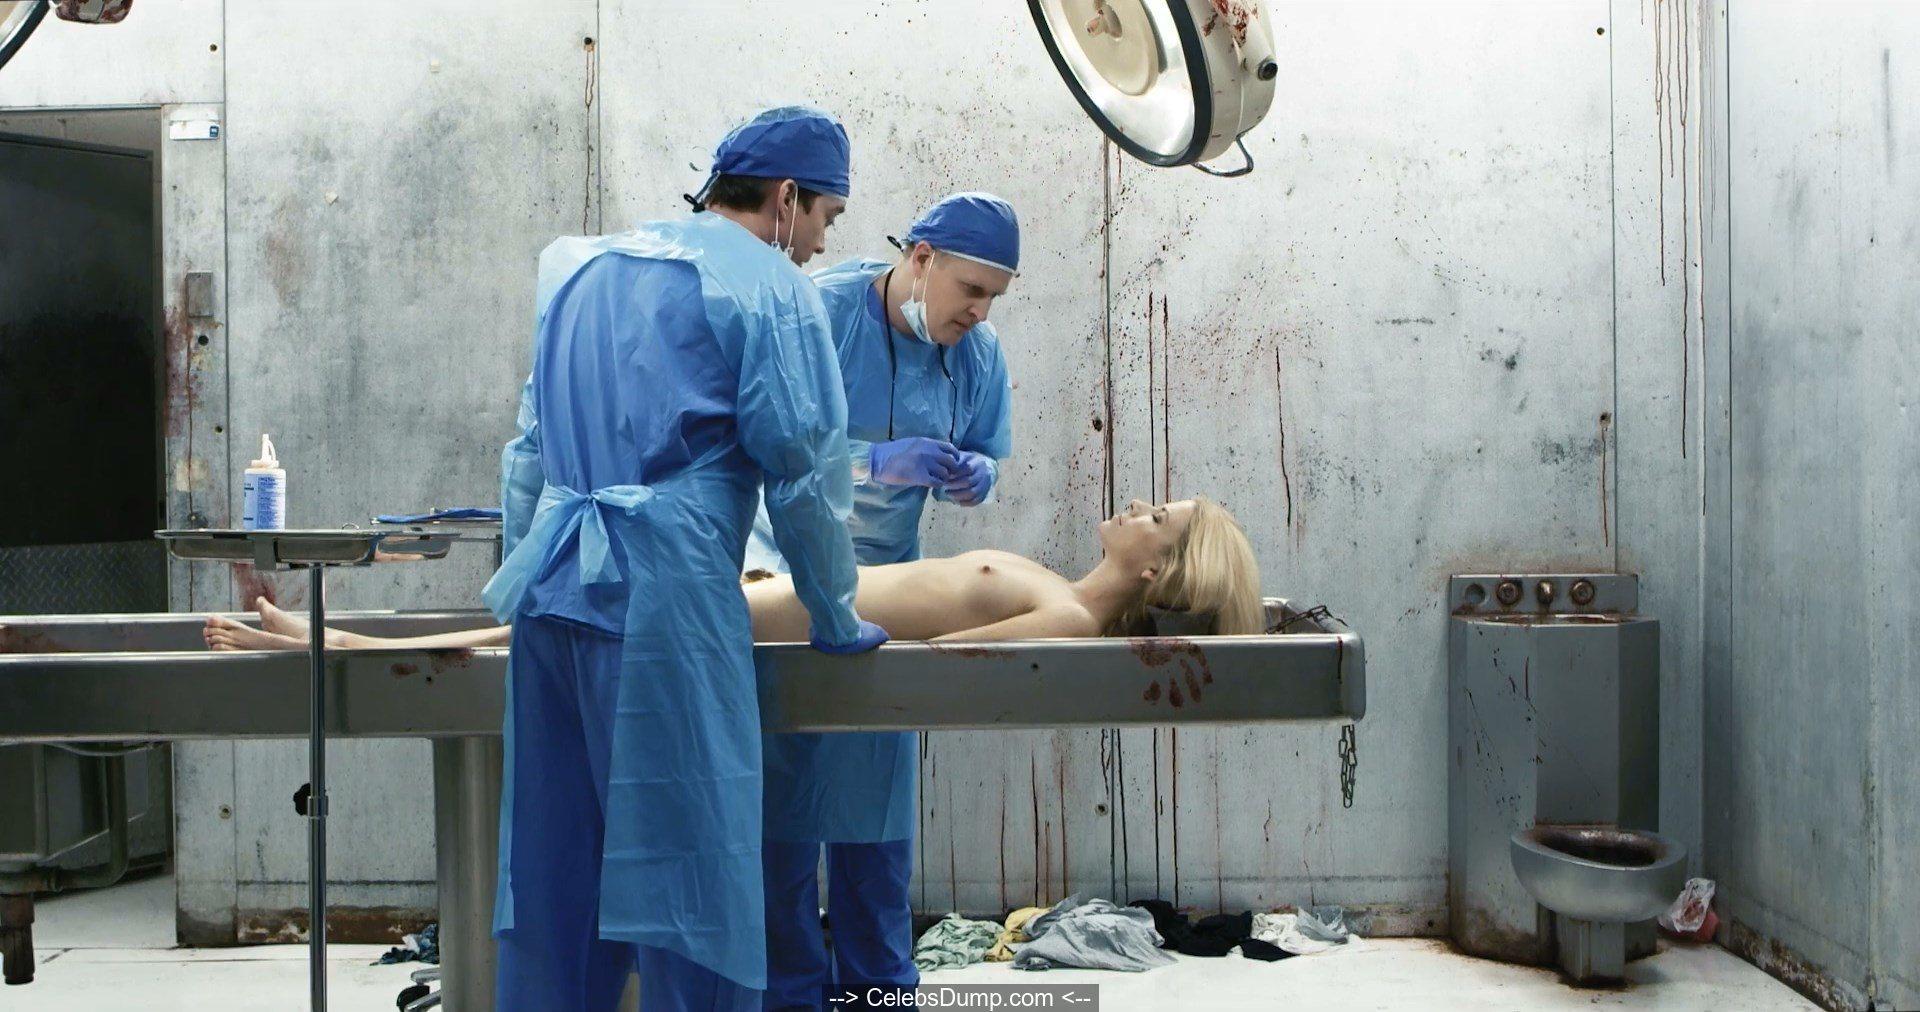 Sexiest The Paramedic Nude Scenes, Top Pics Pics